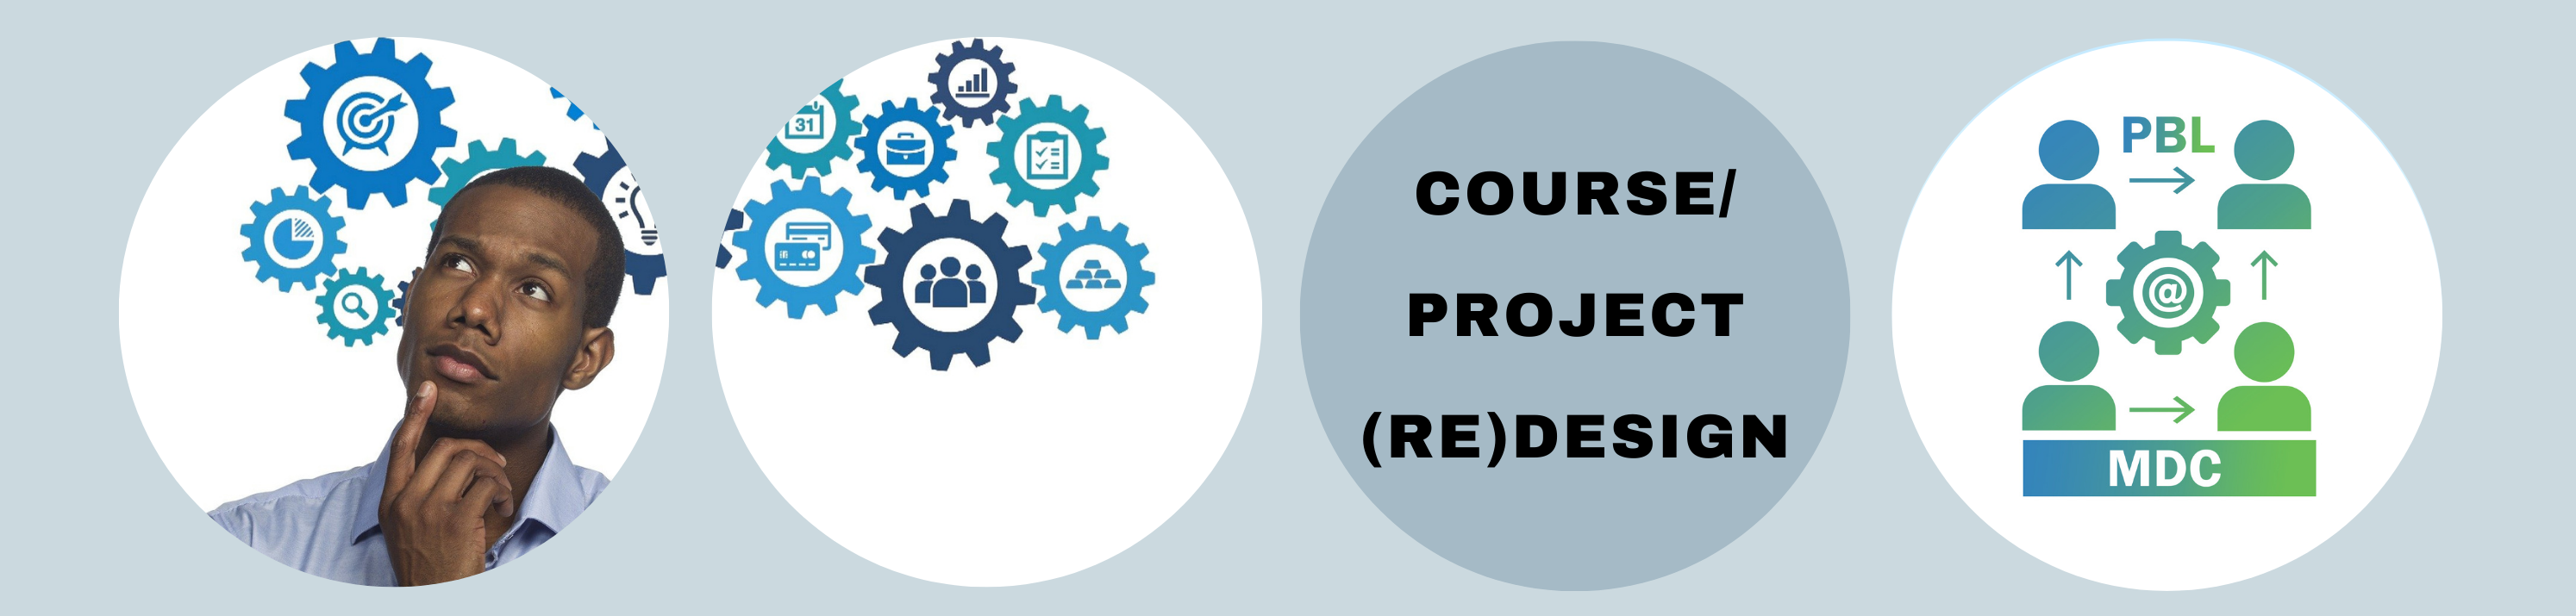 Course/Project (Re)Design